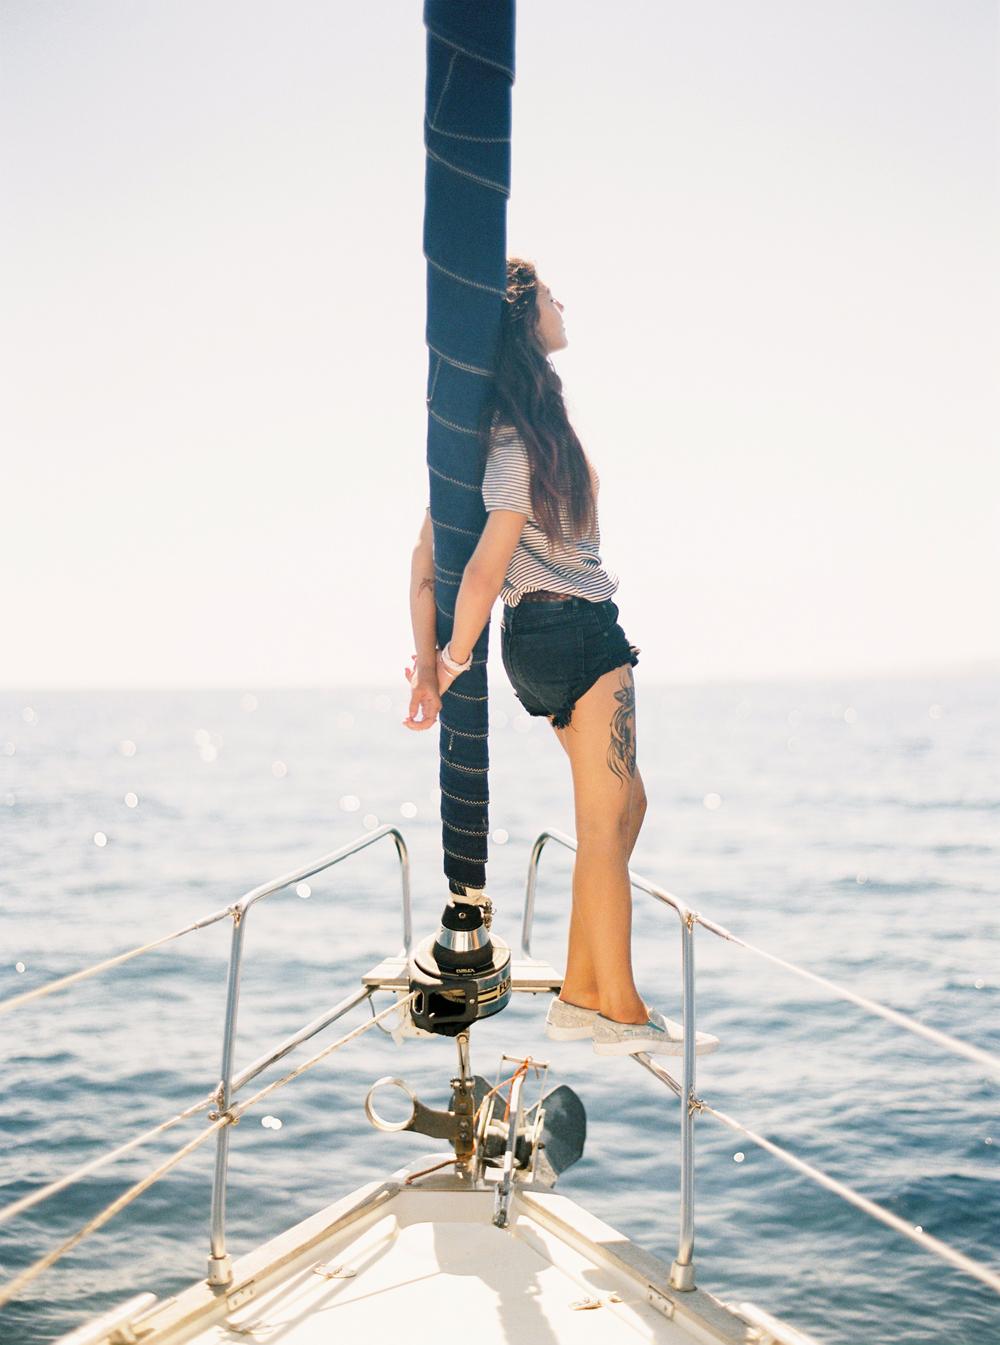 Yachting+Bailkal-11.jpg